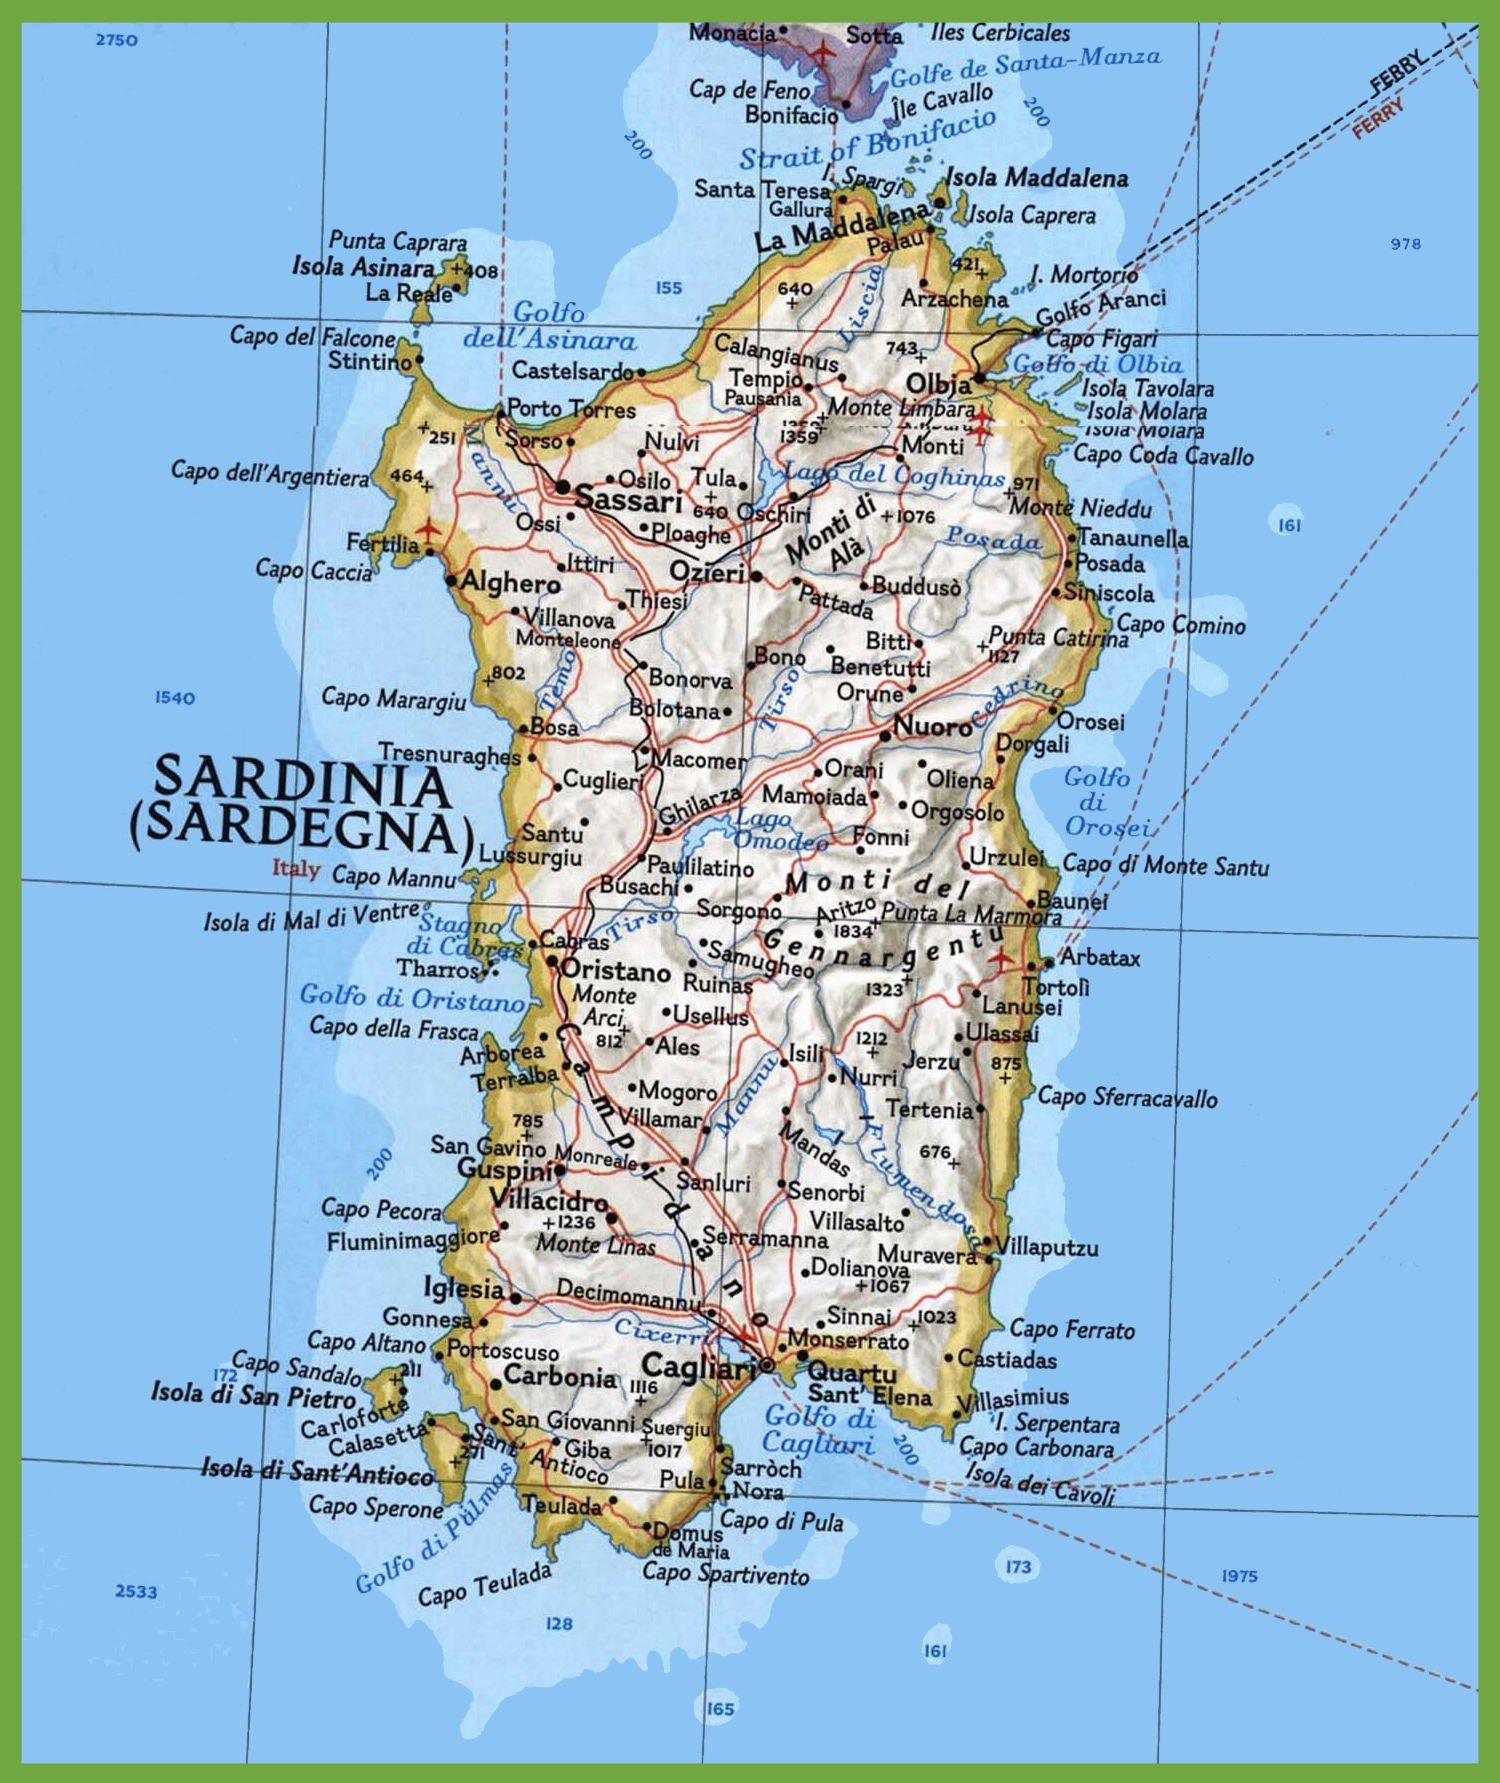 Map Of Sardinia Map of Sardinia with cities and towns Map Of Sardinia